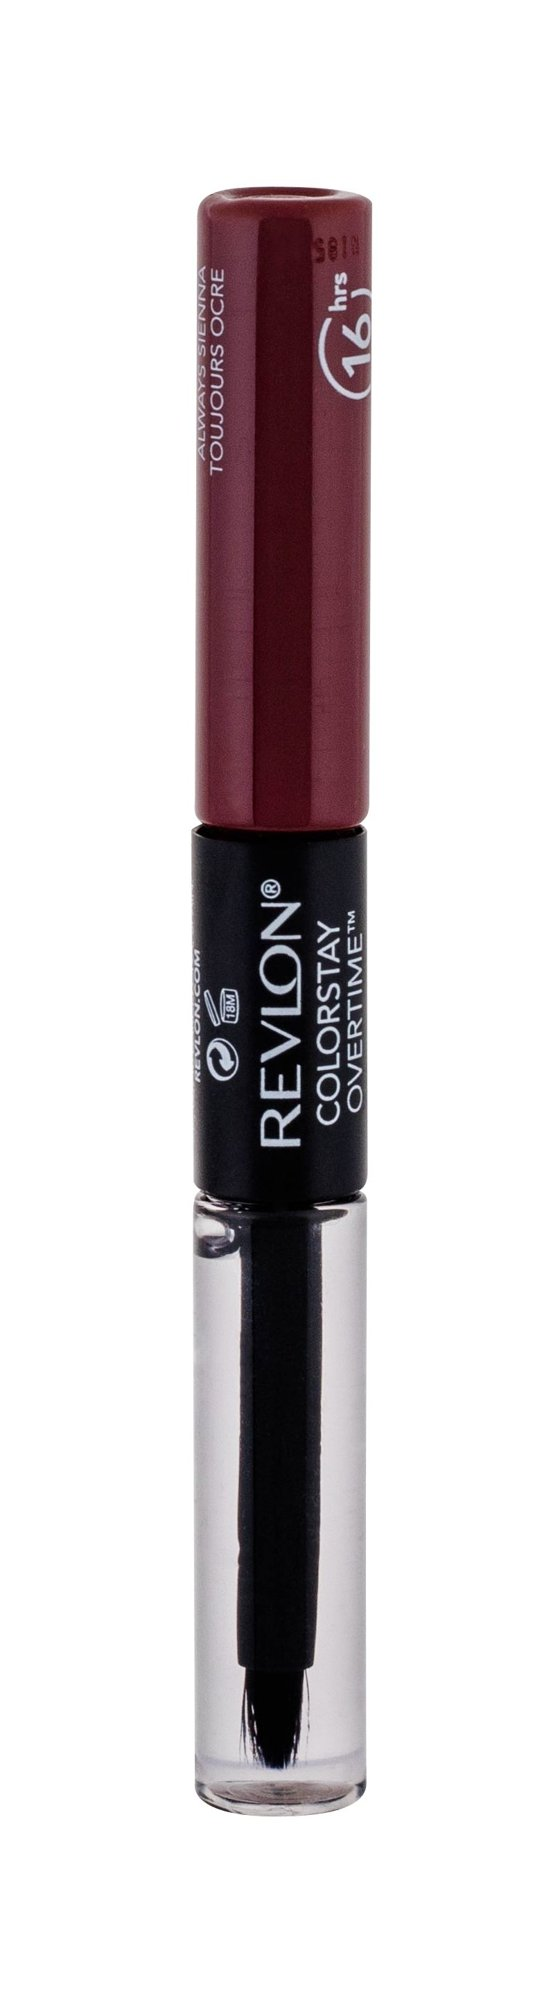 Revlon Colorstay Lipstick 4ml 380 Always Sienna